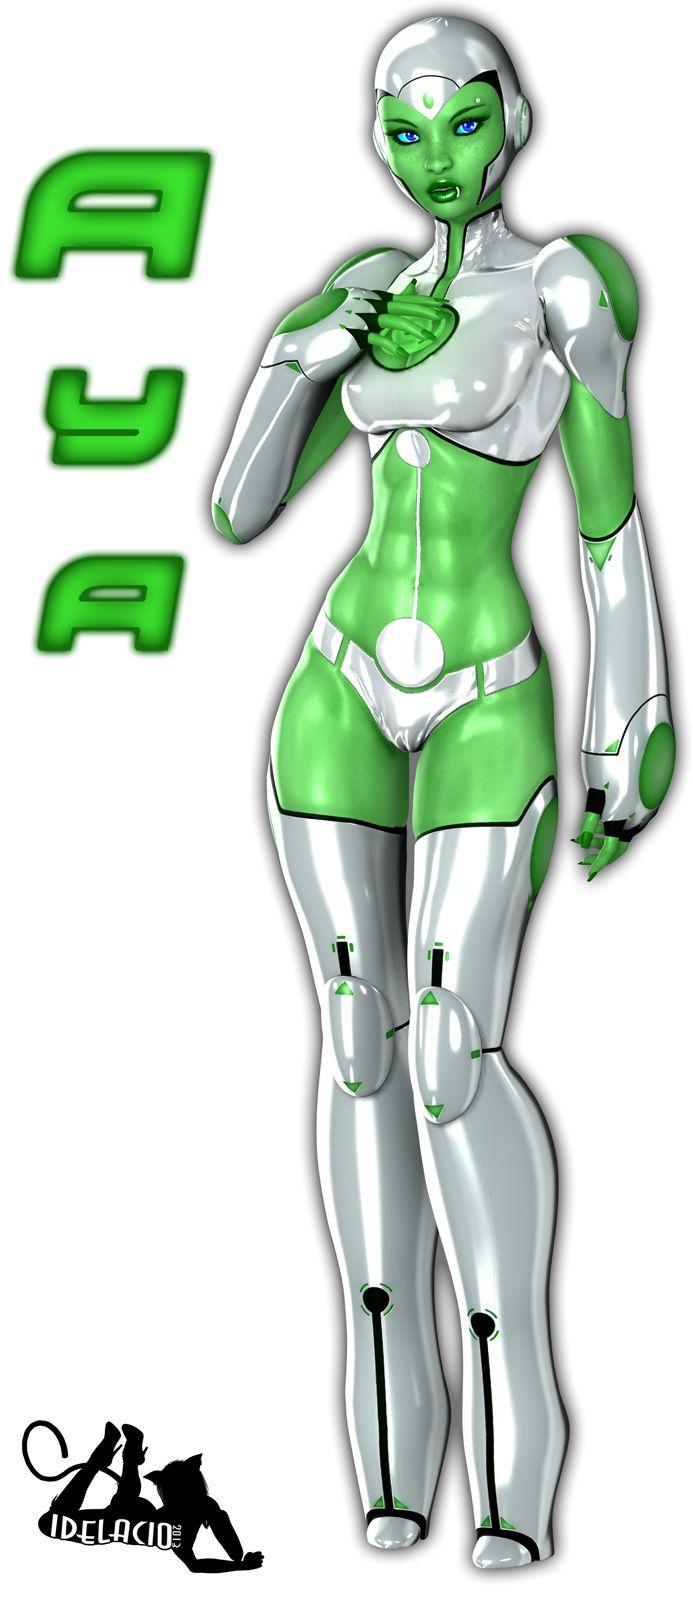 Aya, Green Lantern by Idelacio.deviantart.com on @deviantART